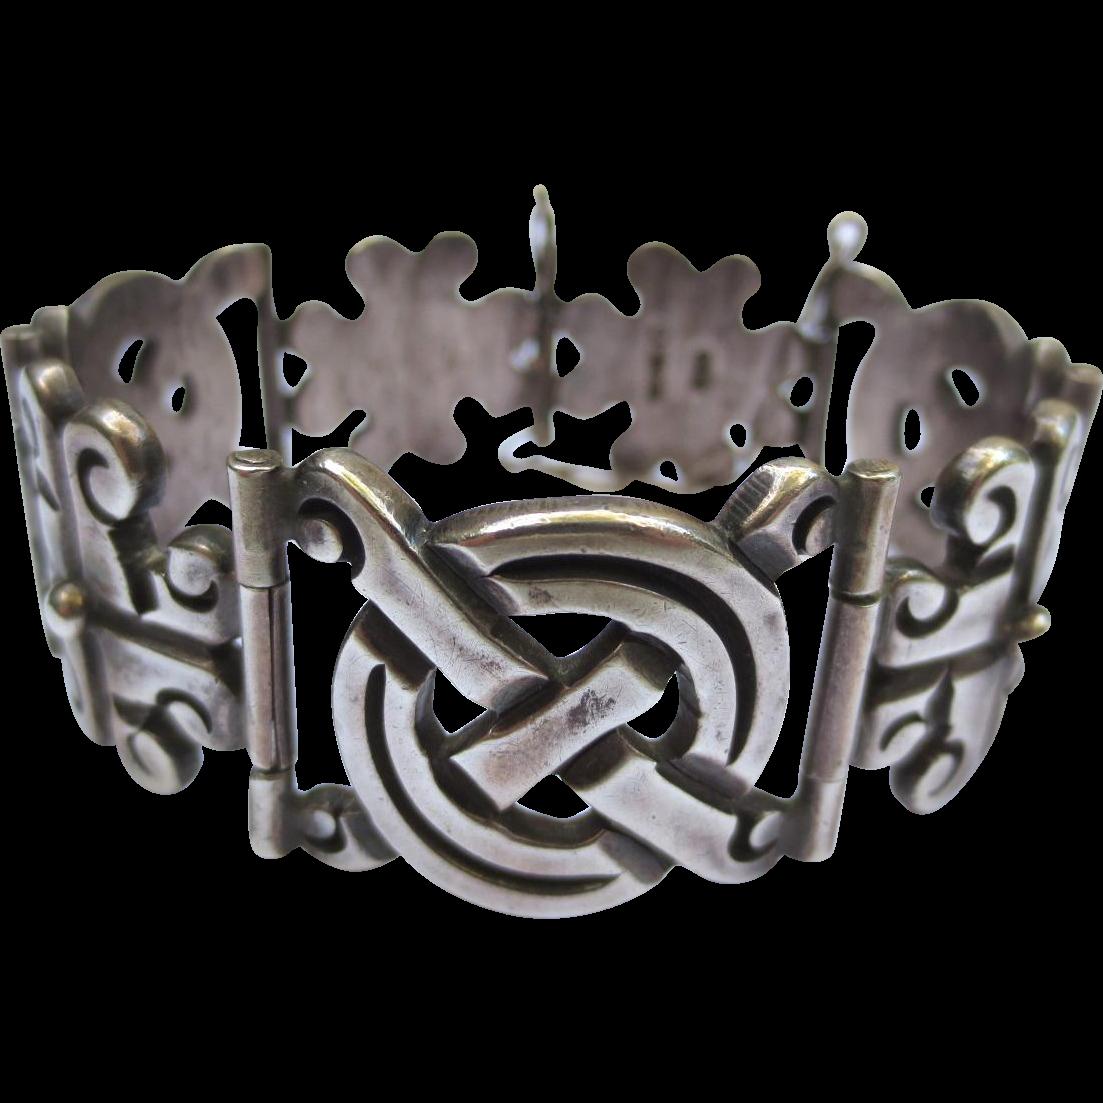 Vintage Taxco 980 Silver Mexican Link Bracelet